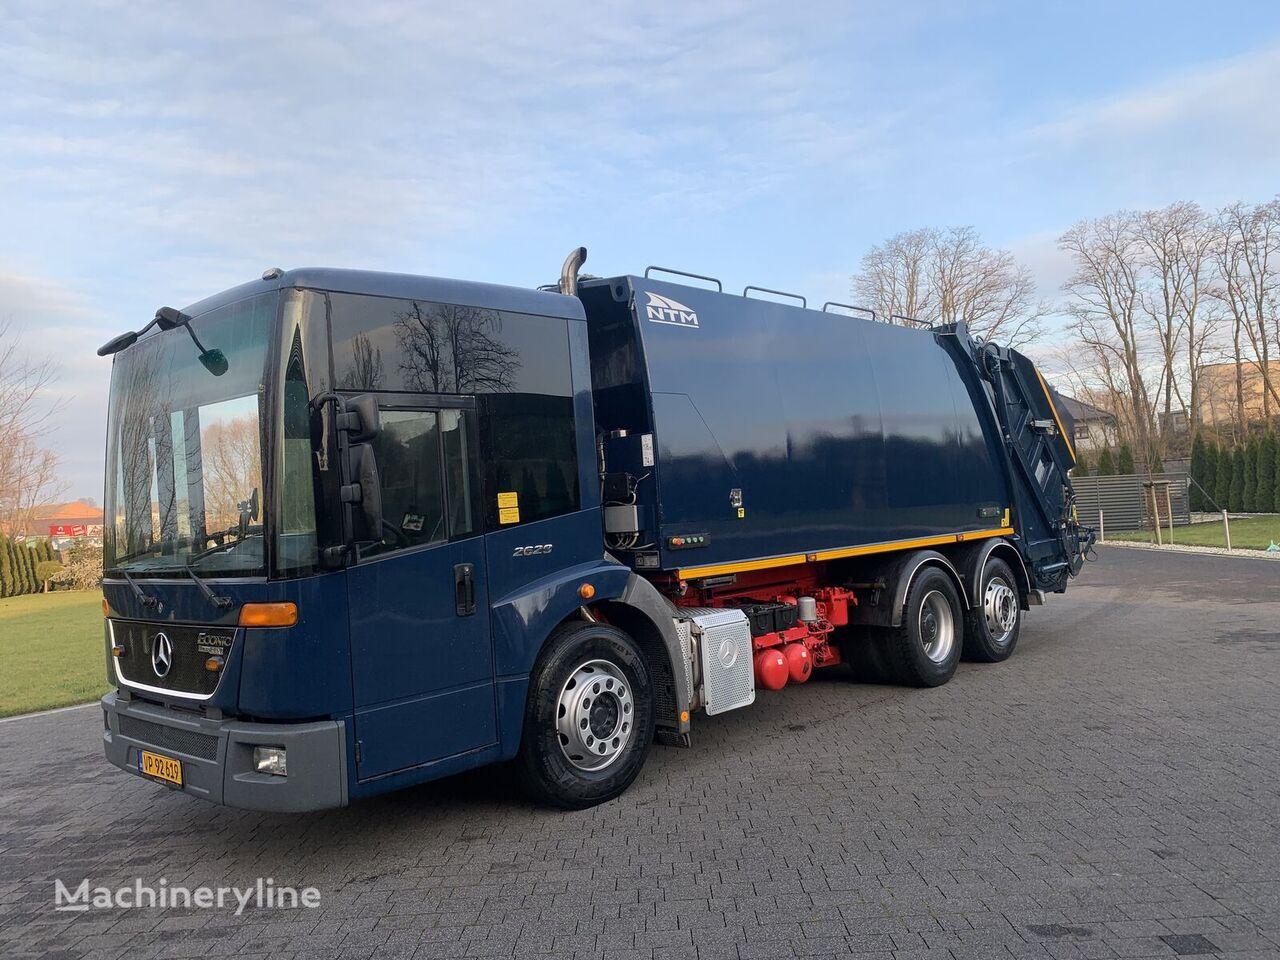 MERCEDES-BENZ Econic 2629 NTM garbage truck